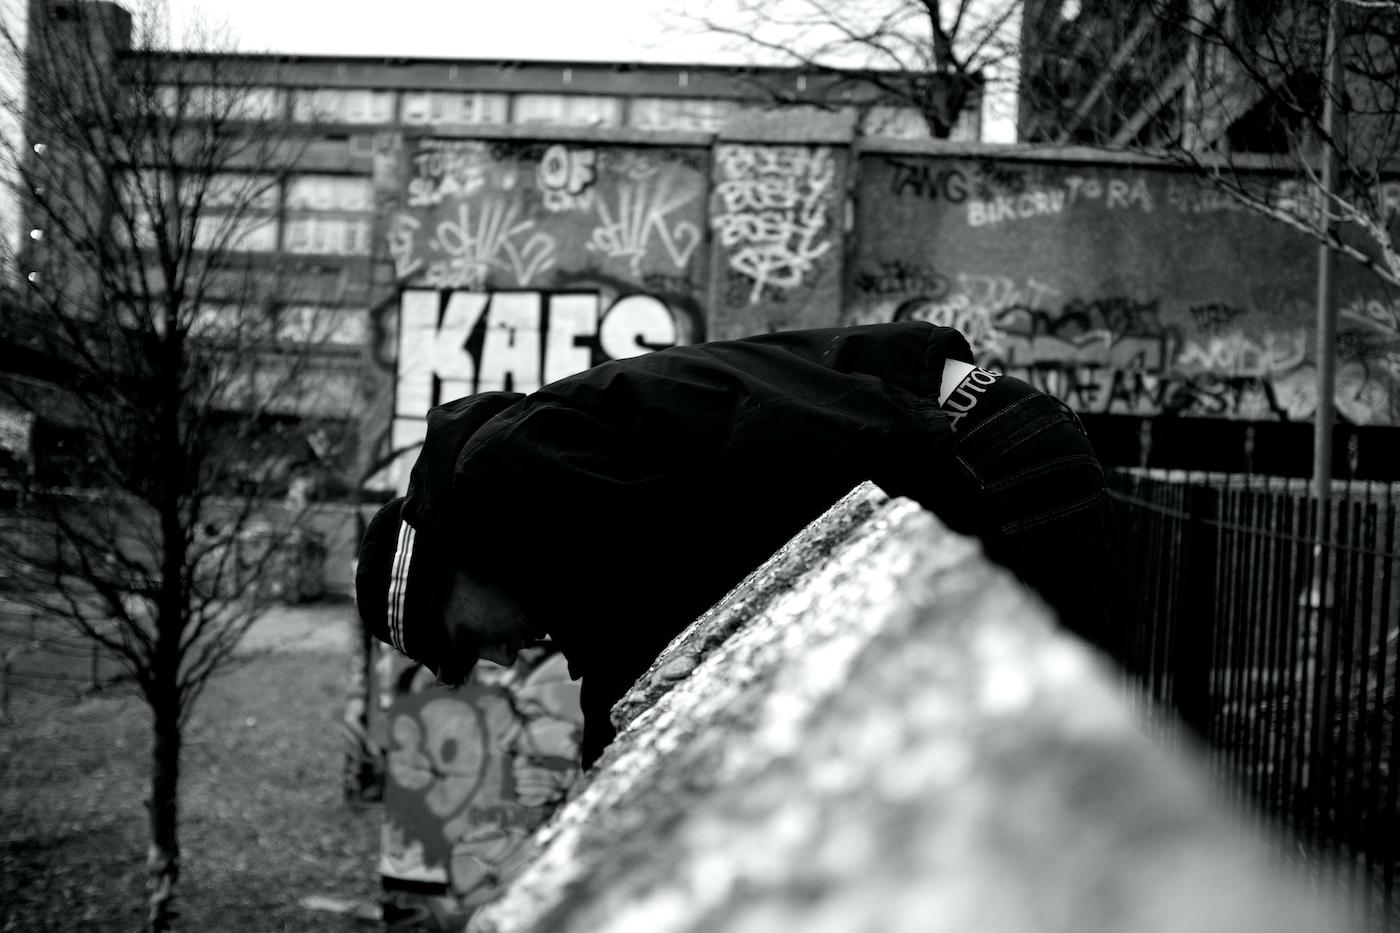 Graffiti writer on Thursday 3 December 2015 in London, England. © Marc Vallée, 2015